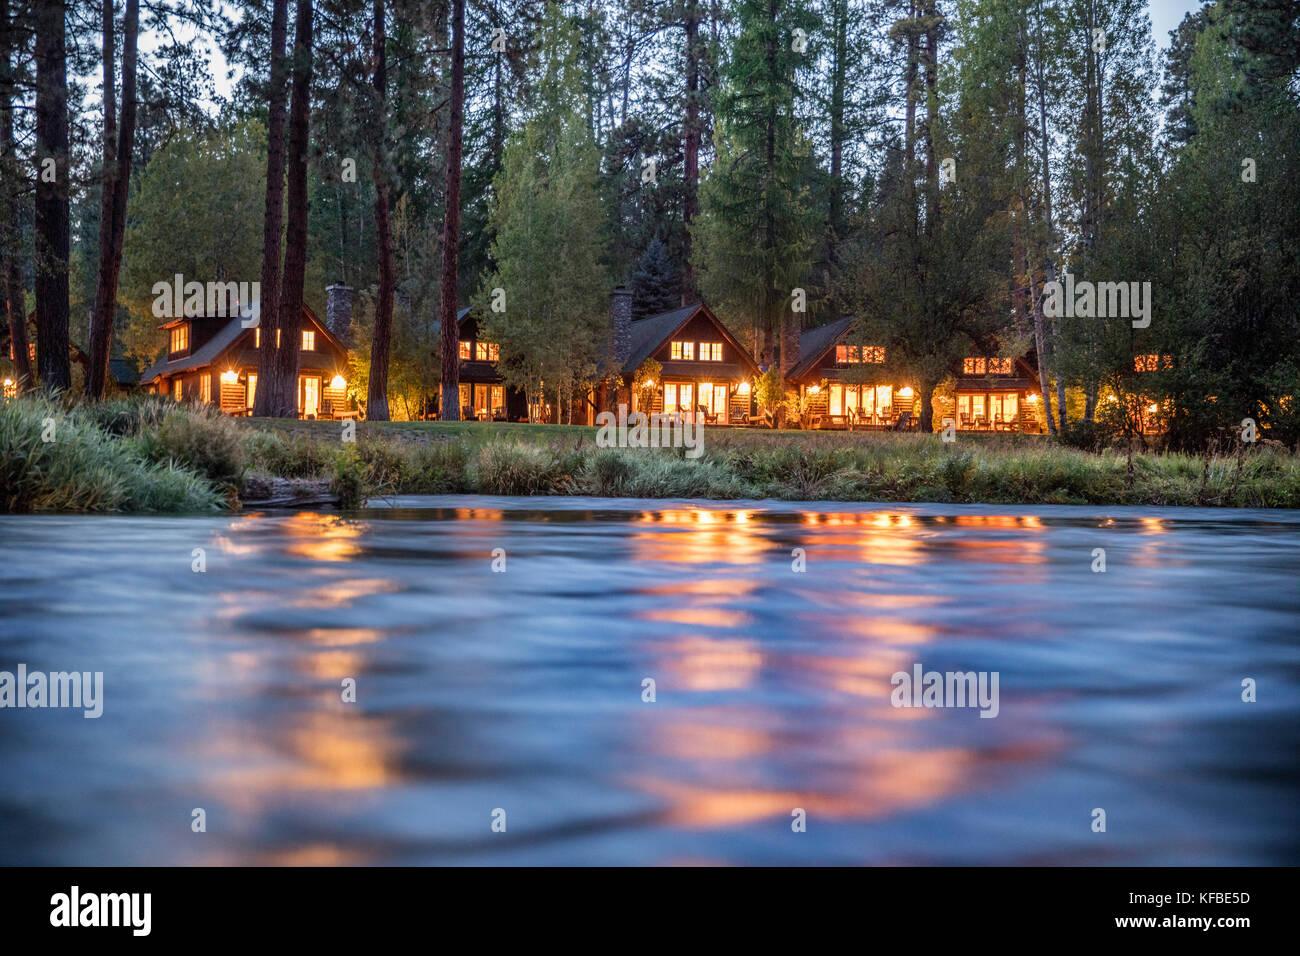 USA, Oregon, Camp Sherman, Metolius River Resort, View of cabins from River - Stock Image